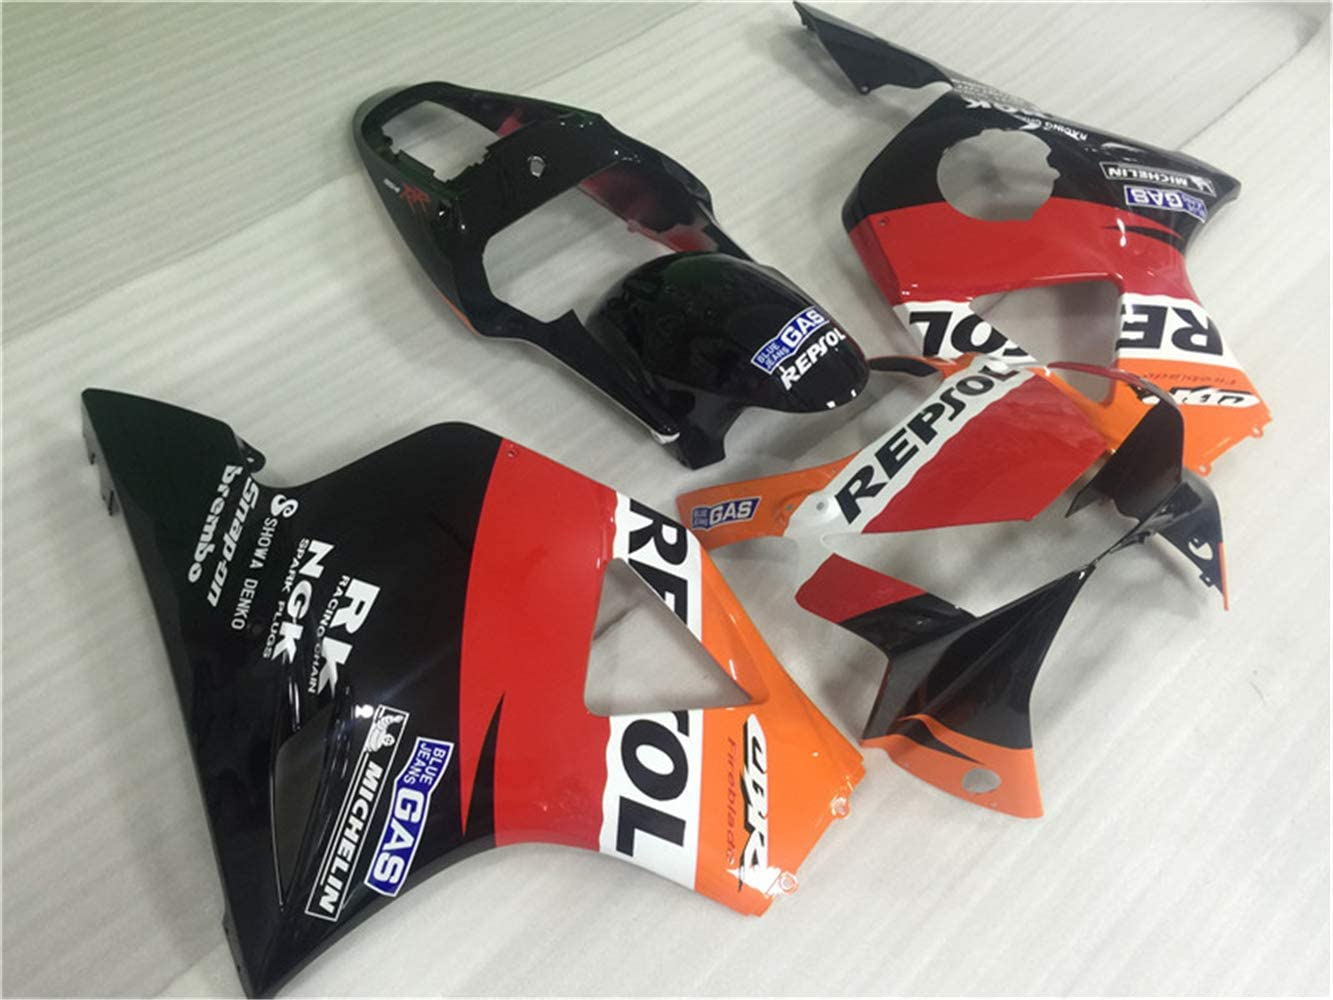 New Orange Repsol Fairing Fit for HONDA 2002 2003 CBR954RR 900RR 954RR Injection Mold ABS Plastics Aftermarket Bodywork Bodyframe Kit Set 02 03